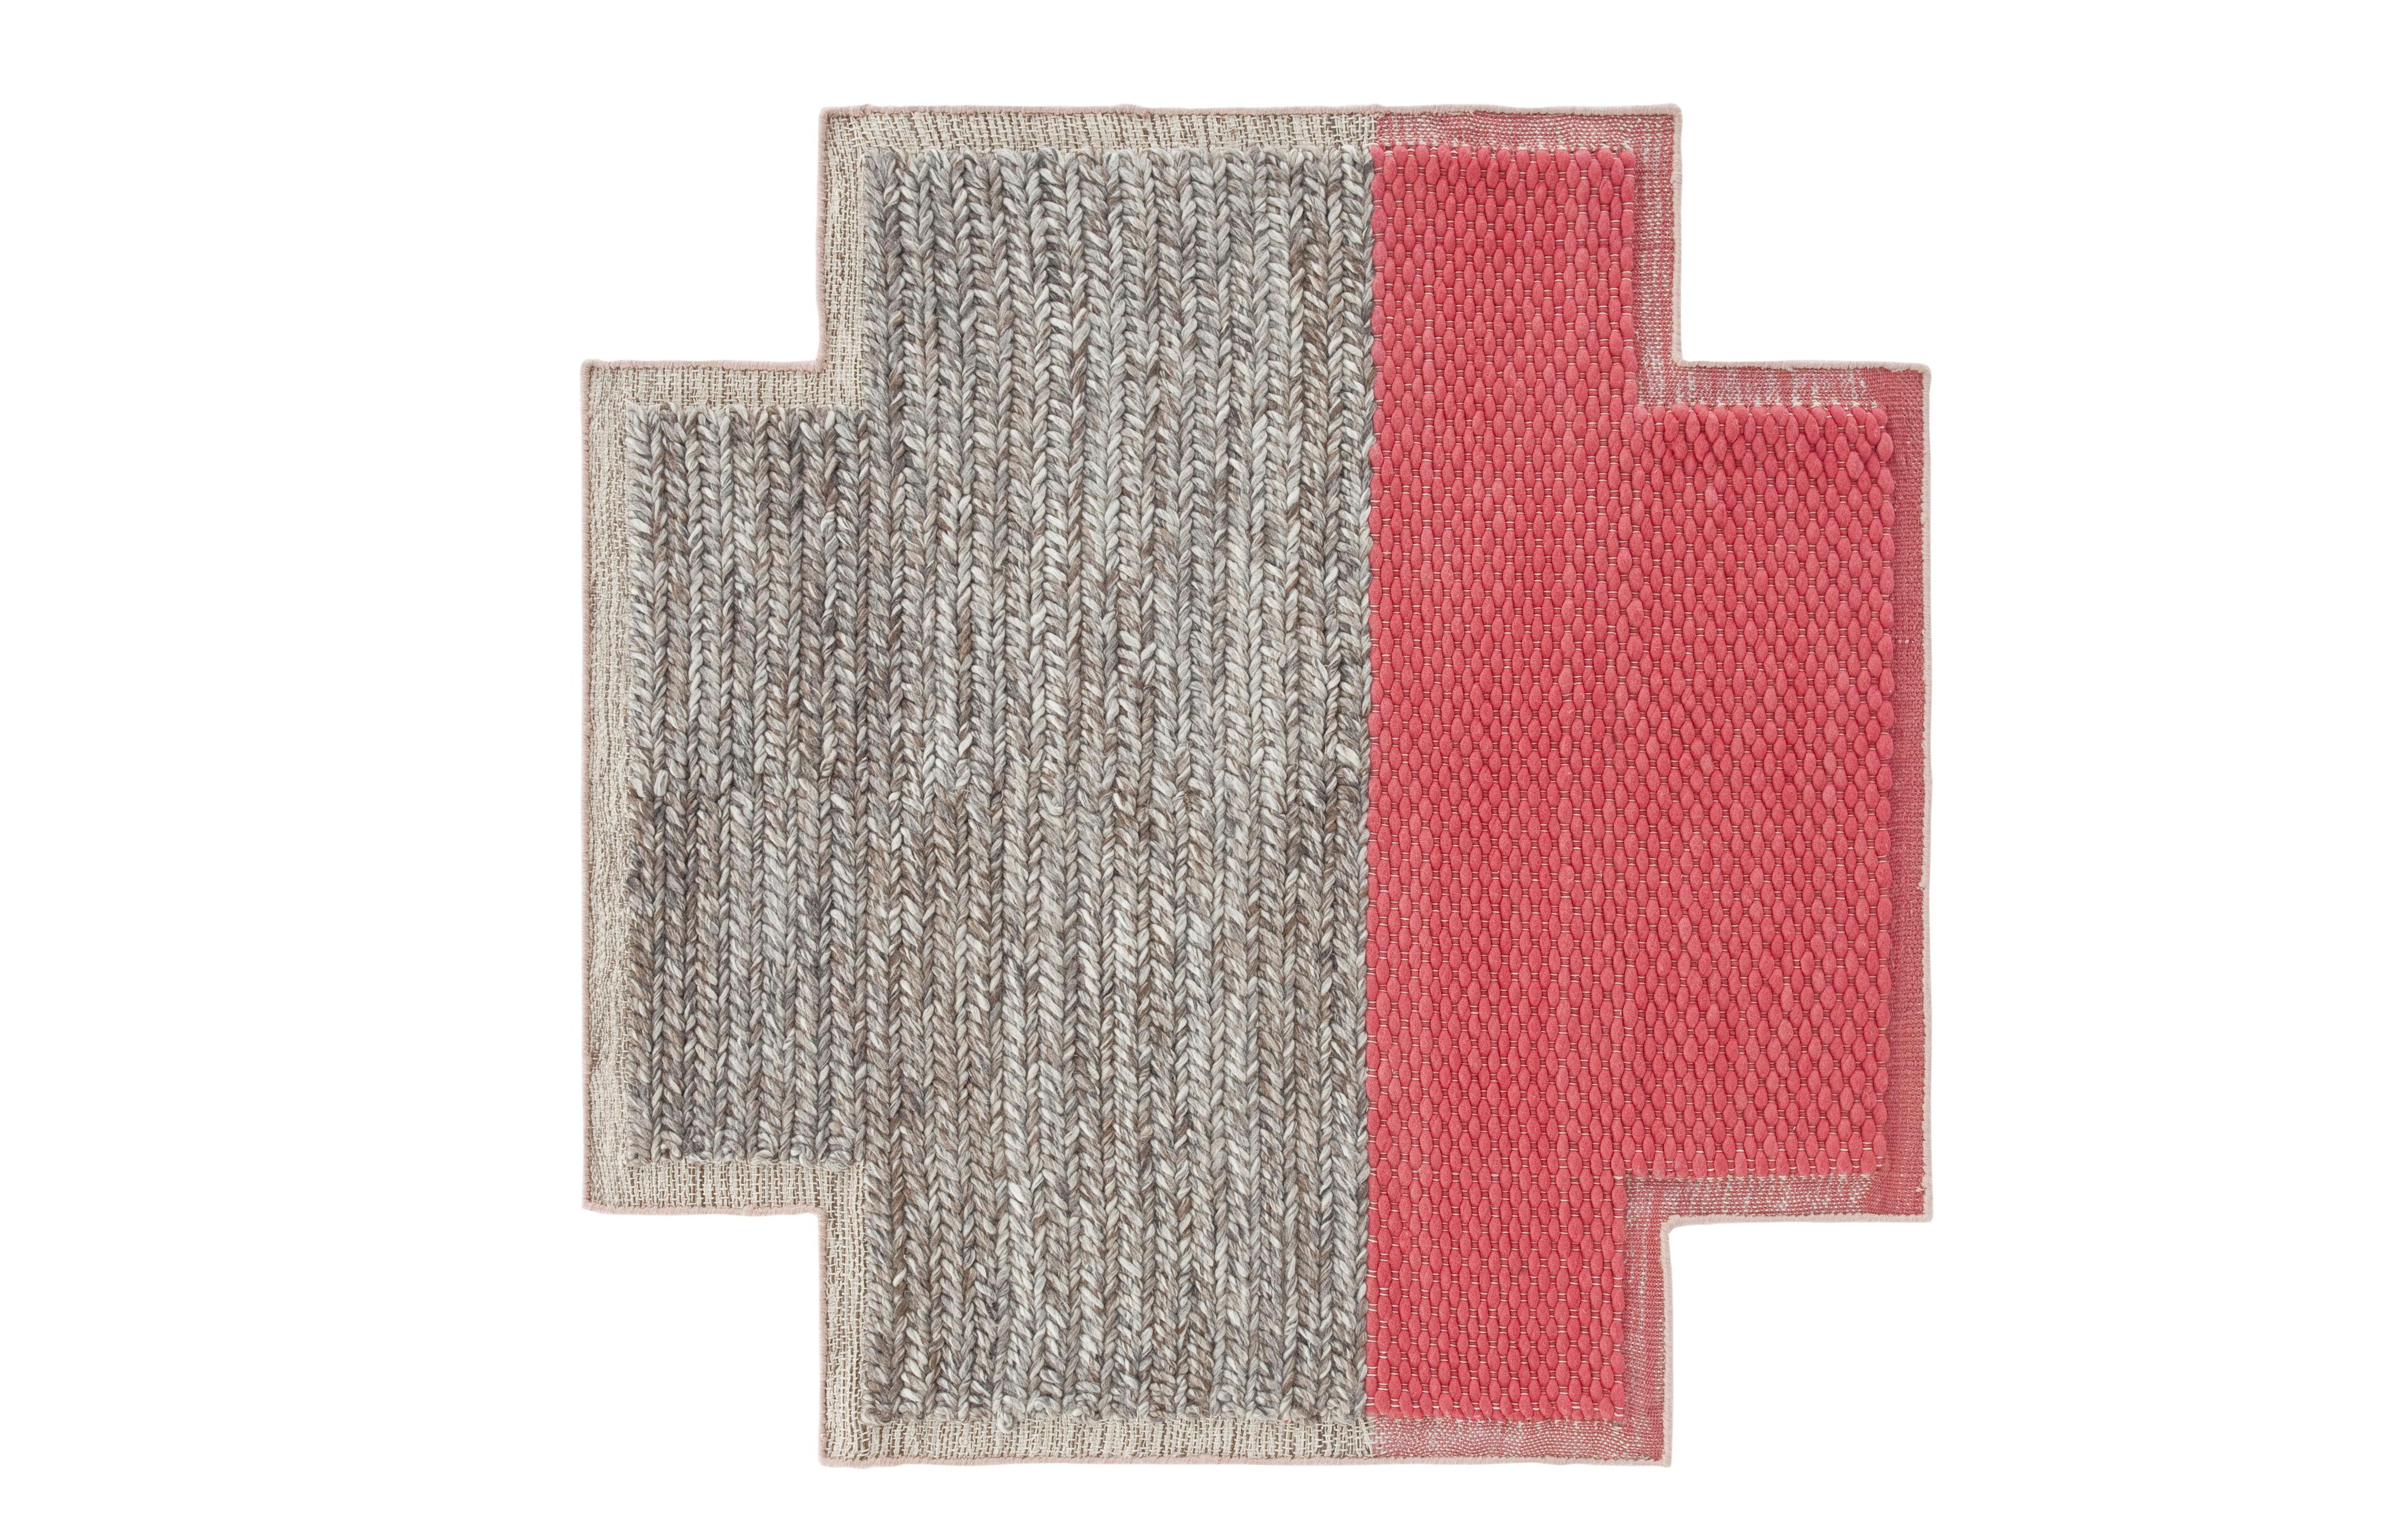 Decoration - Rugs - Mangas Space Plait Rug - / 160 x 160 cm by Gan - Coral - Virgin wool